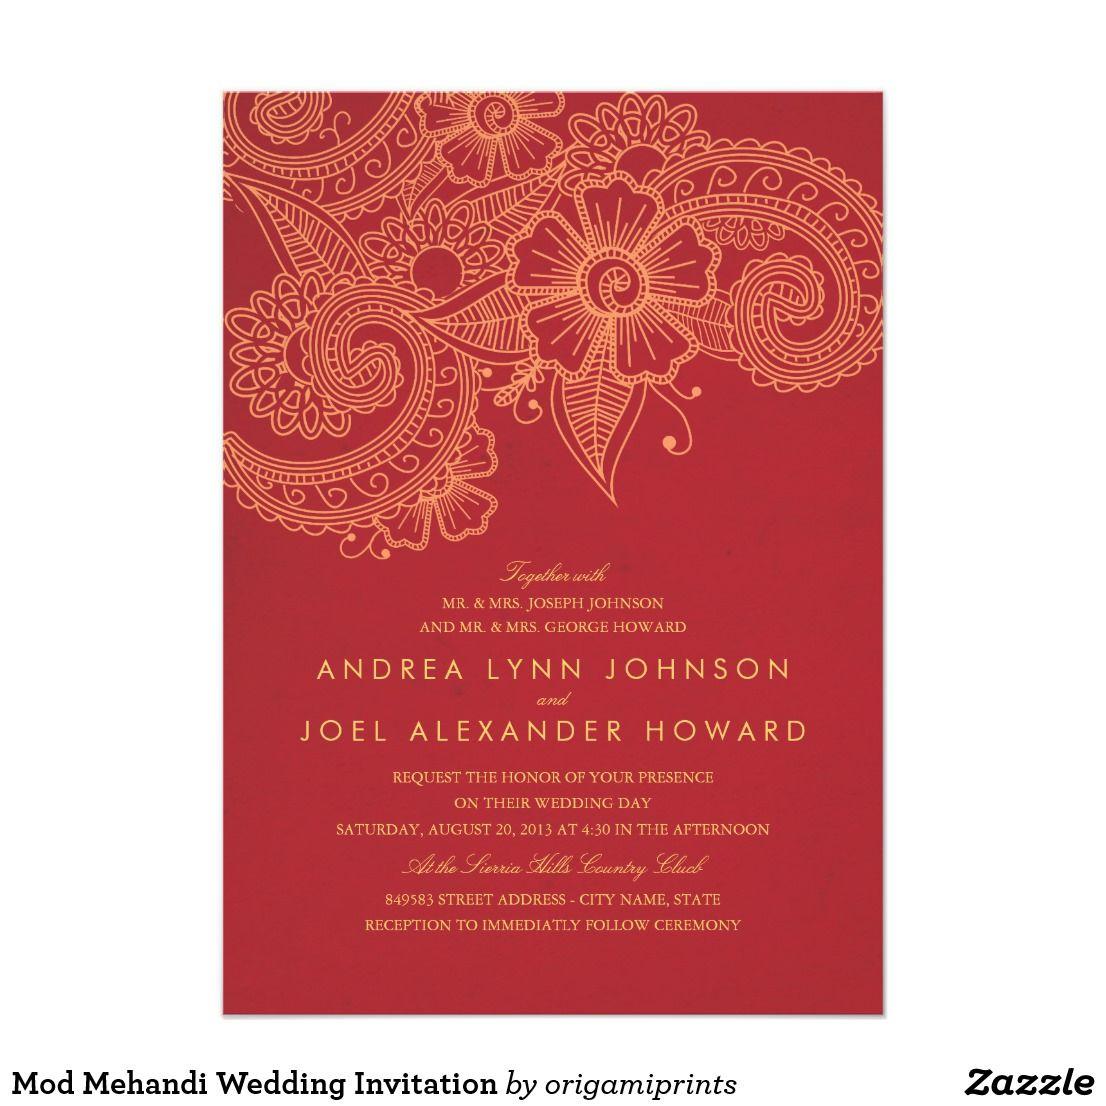 Mod Mehandi Wedding Invitation Elegant henna inspired wedding design ...